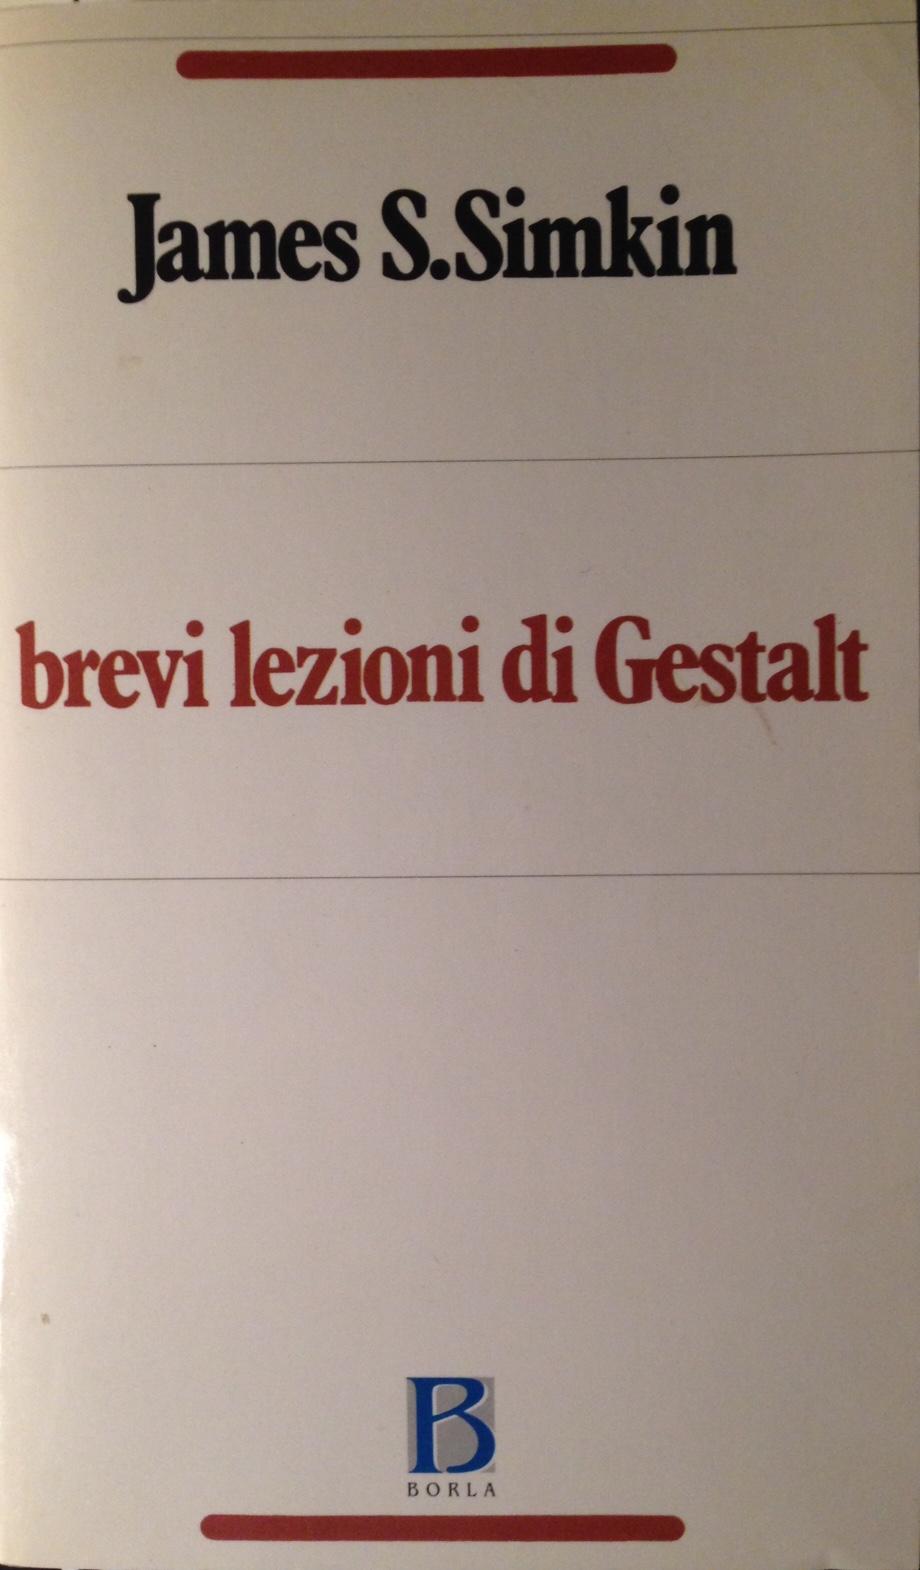 Brevi lezioni di Gestalt